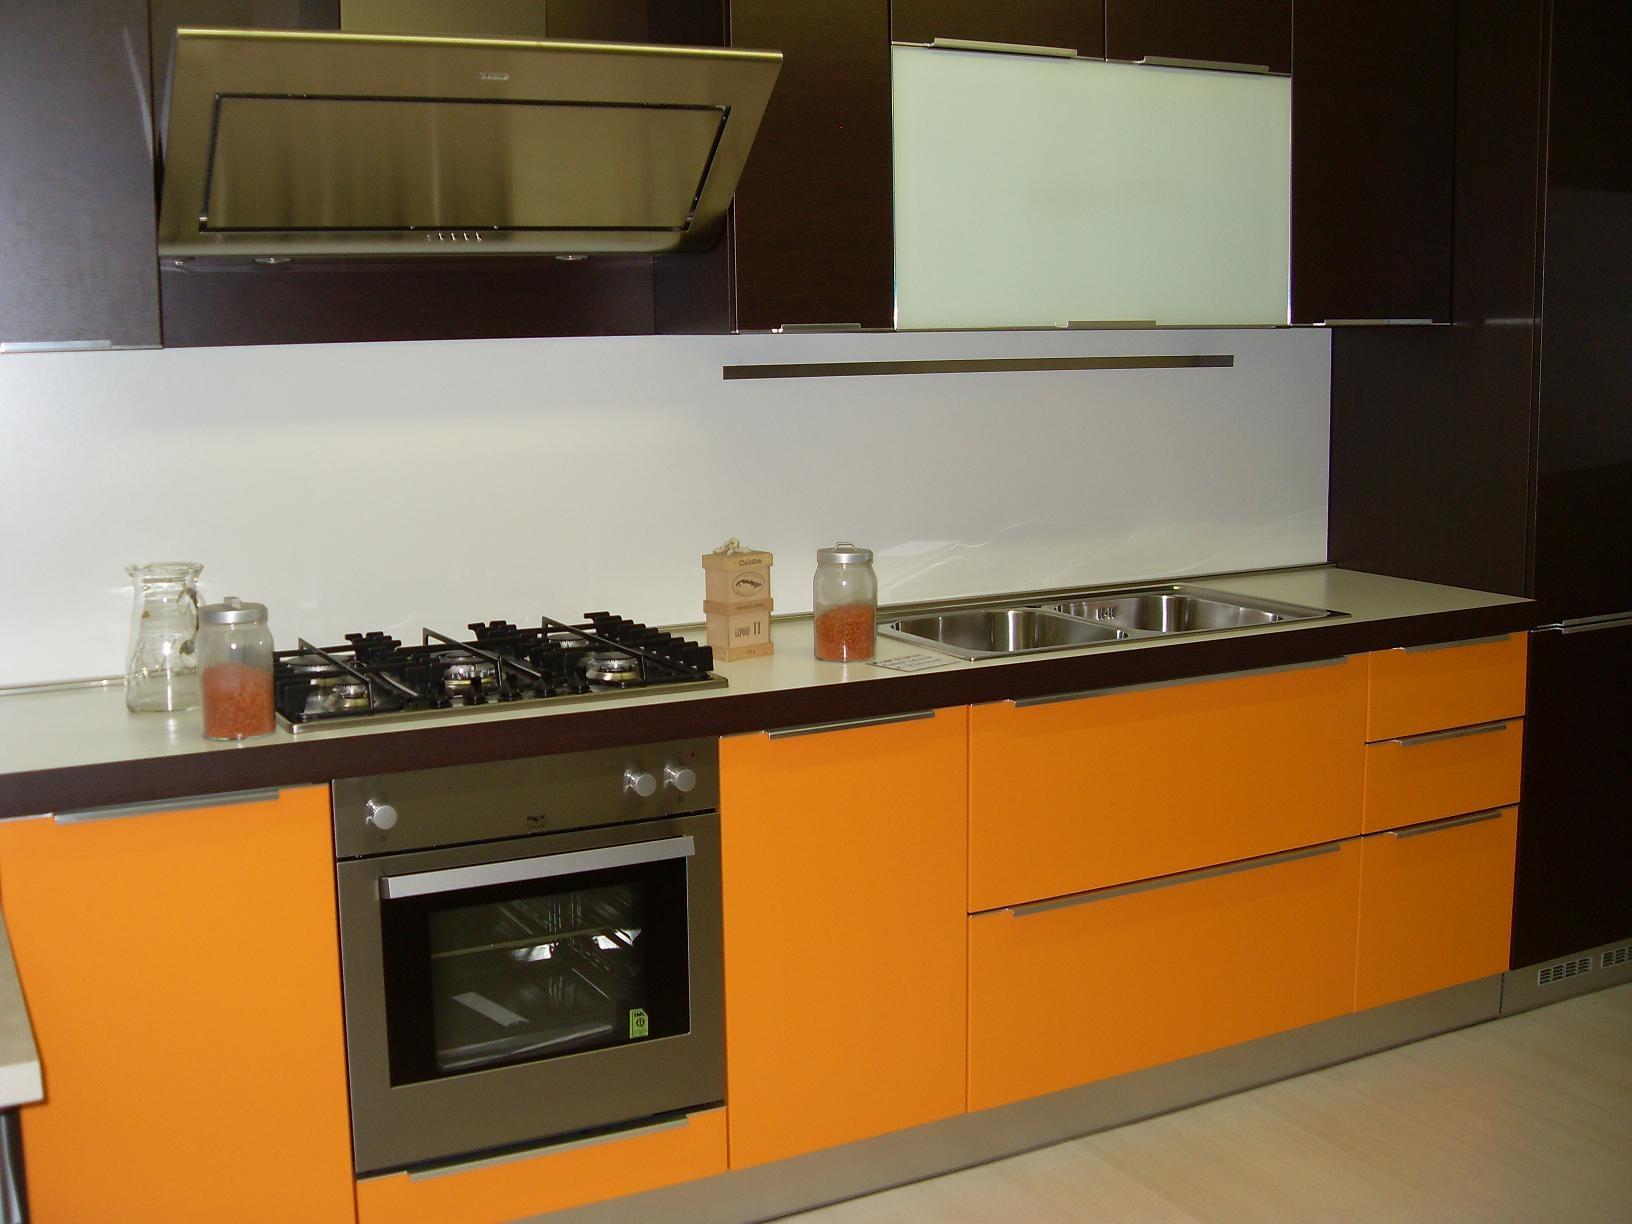 Cucina arredo3 diva moderna laminato opaco arancio for La cucina moderna wikipedia